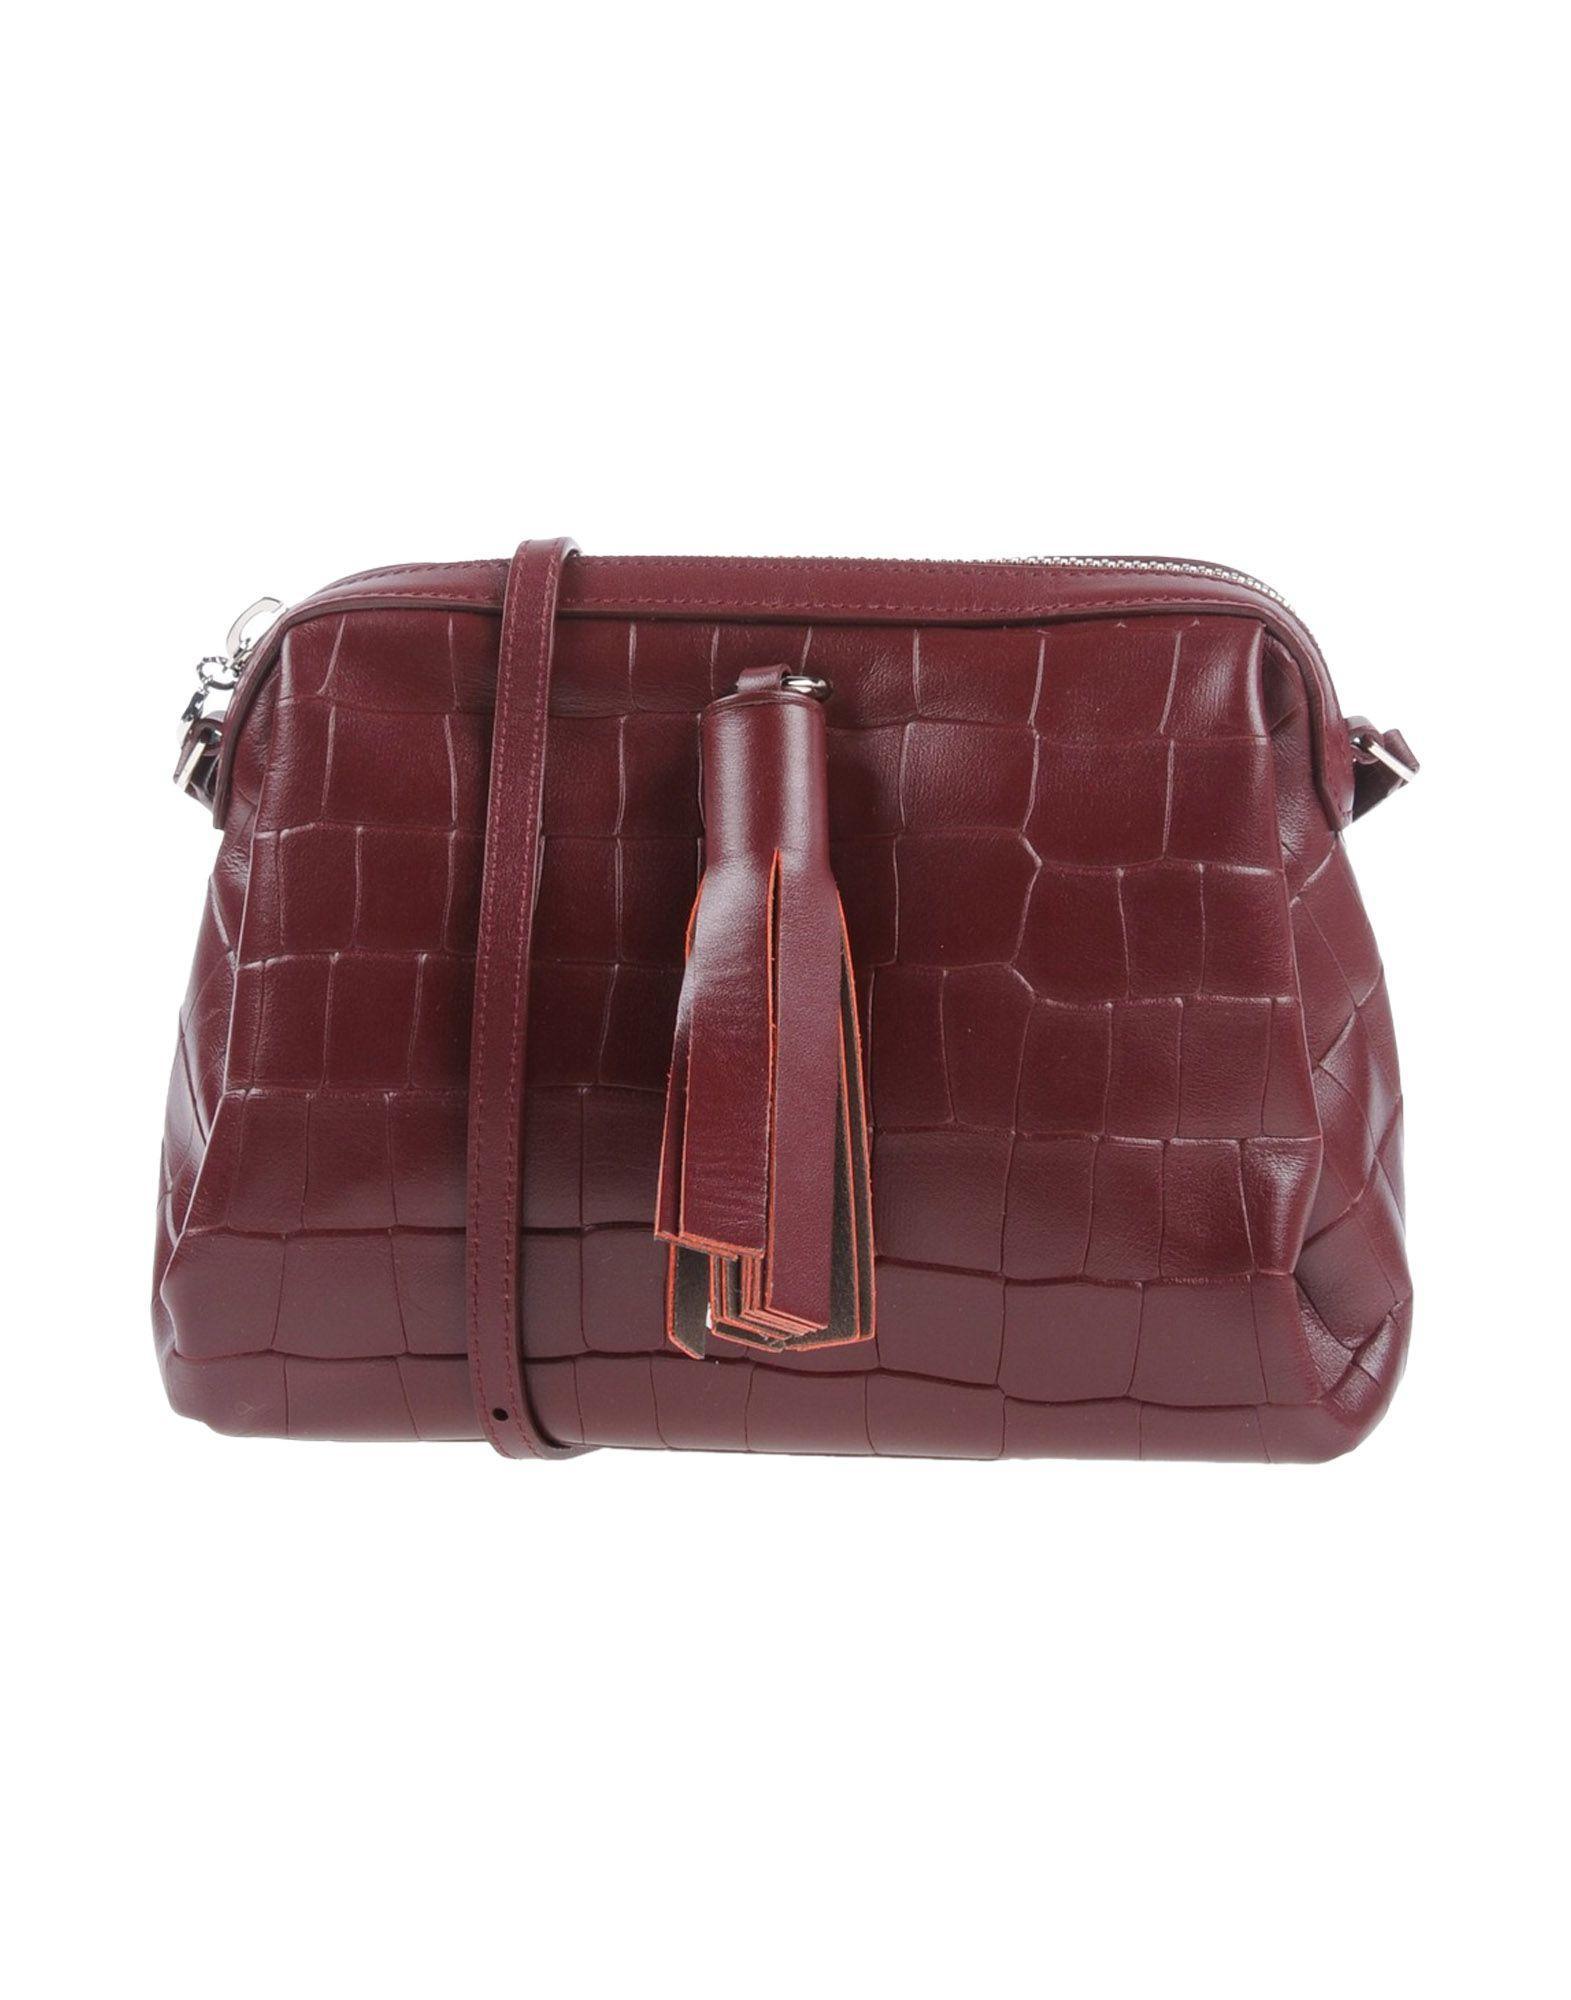 Pollini Across-body Bag In Maroon